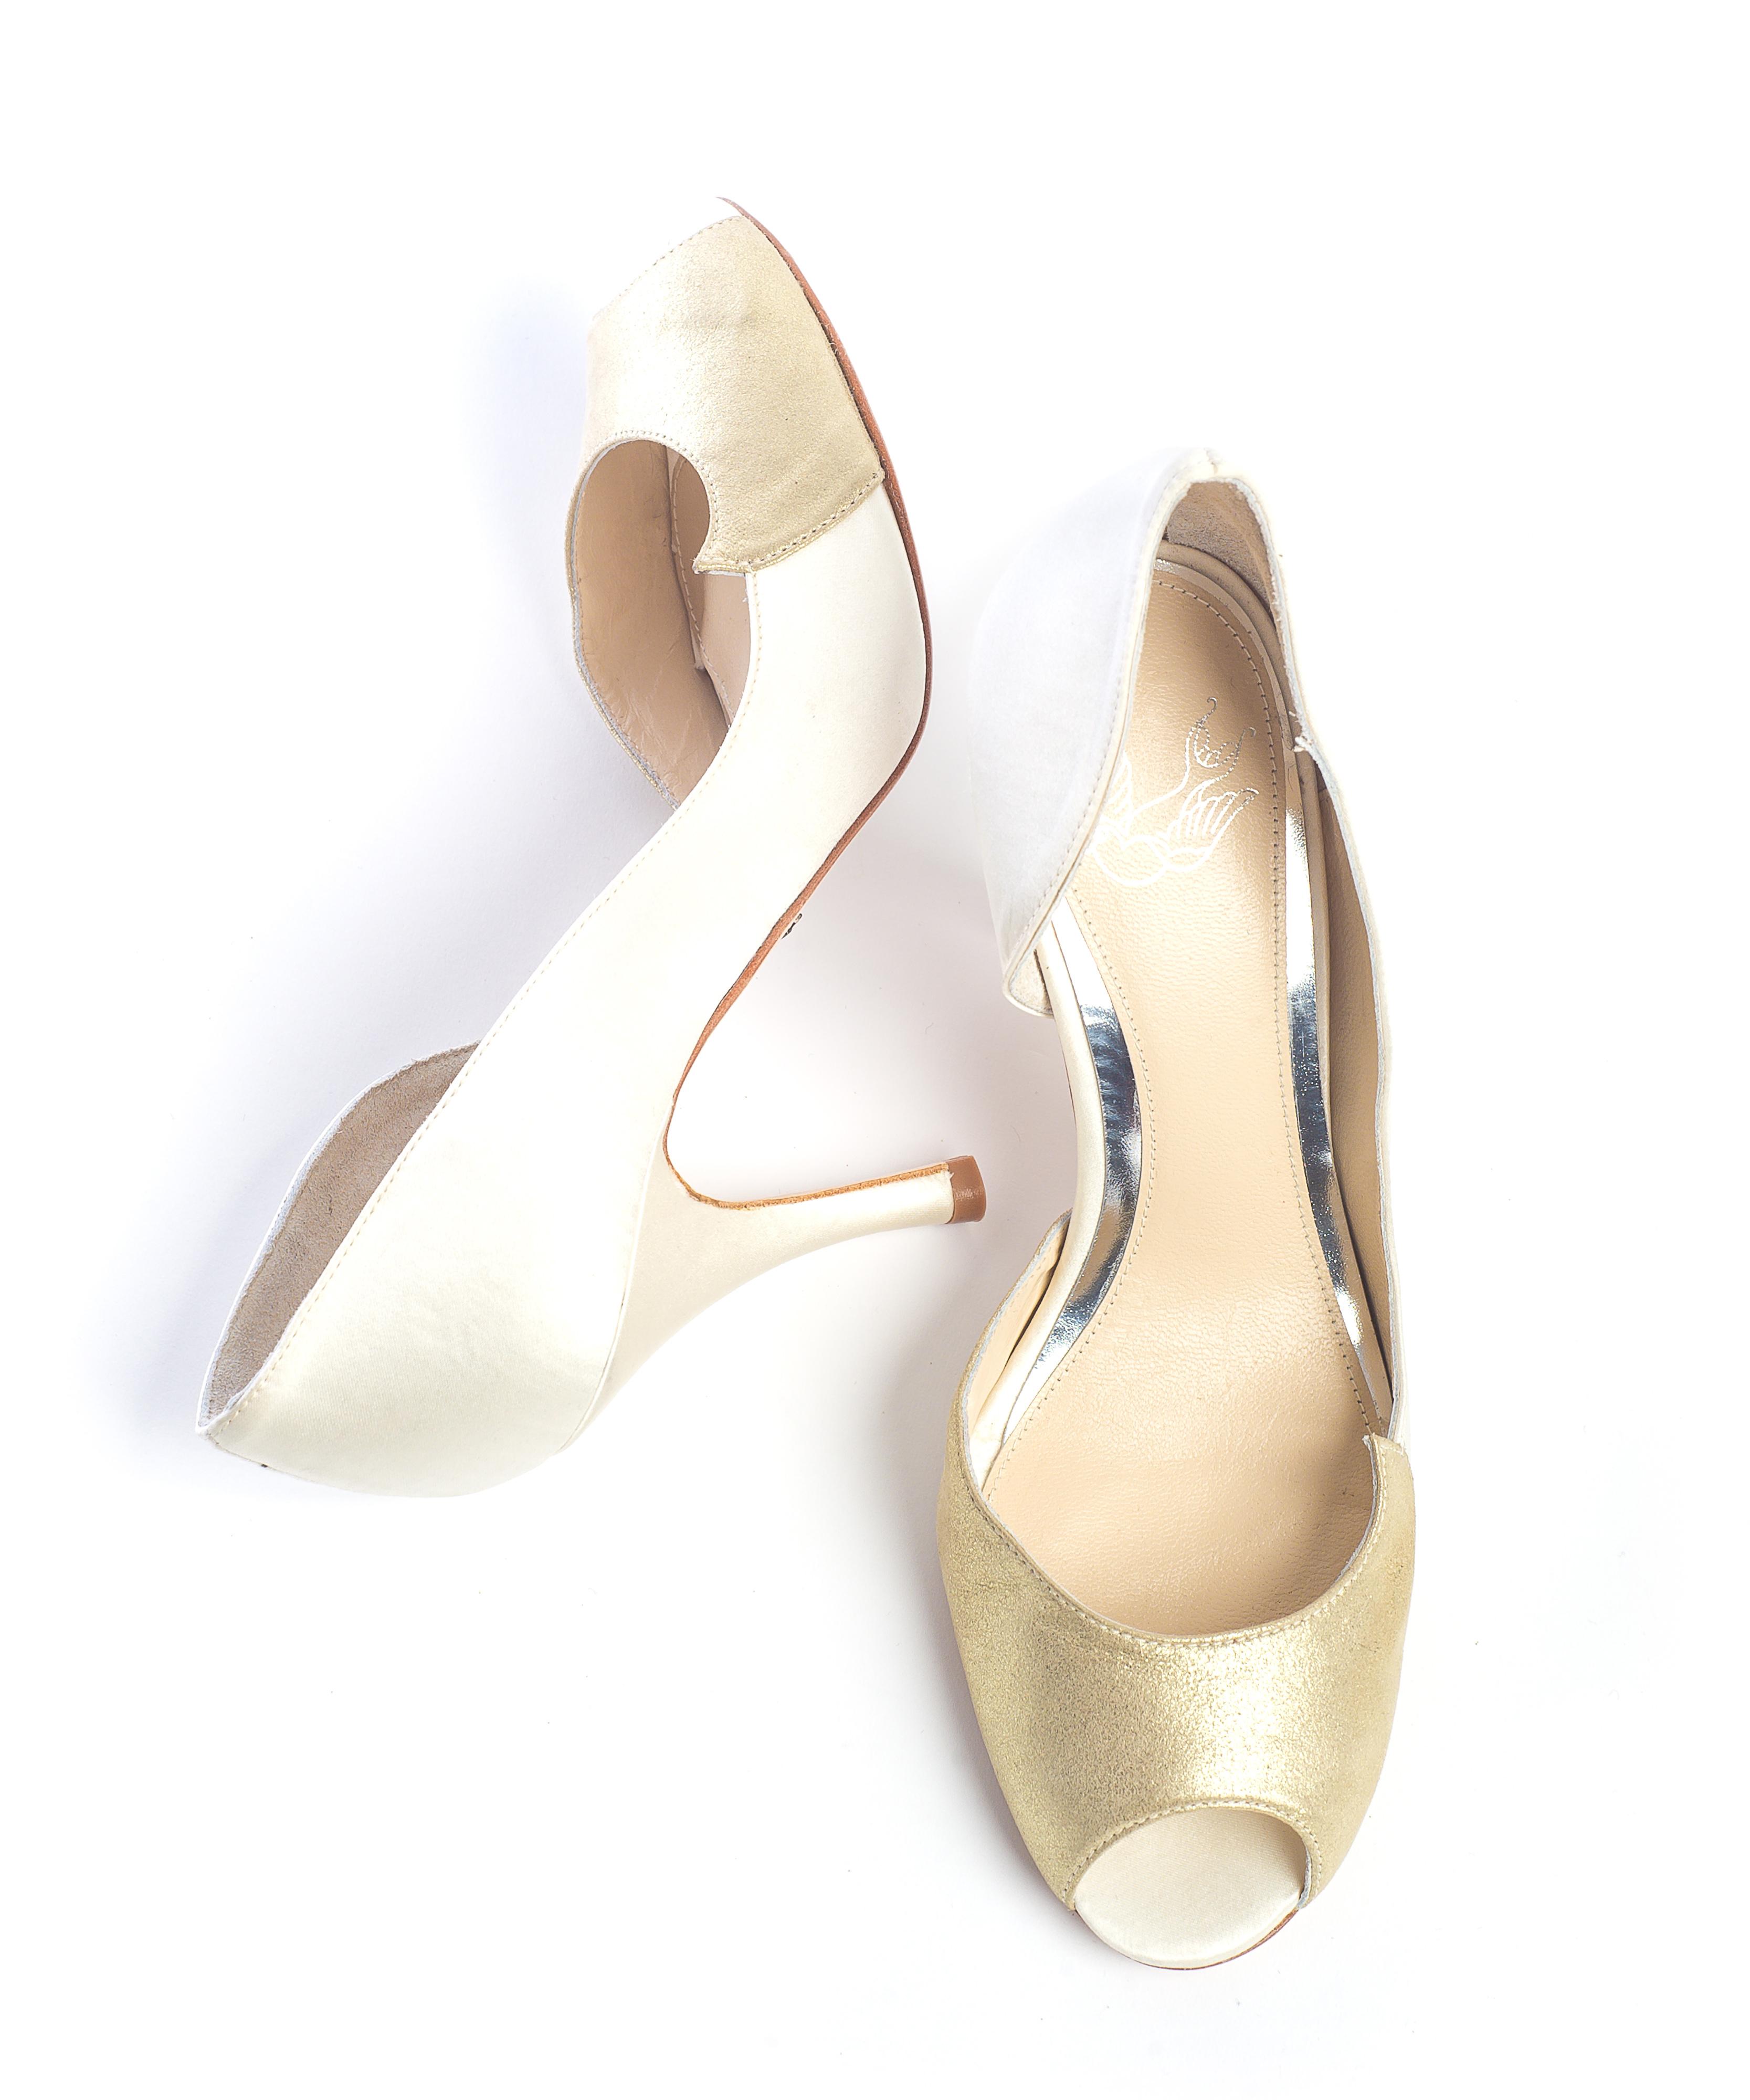 Love Art Wear Art Sabreen heels